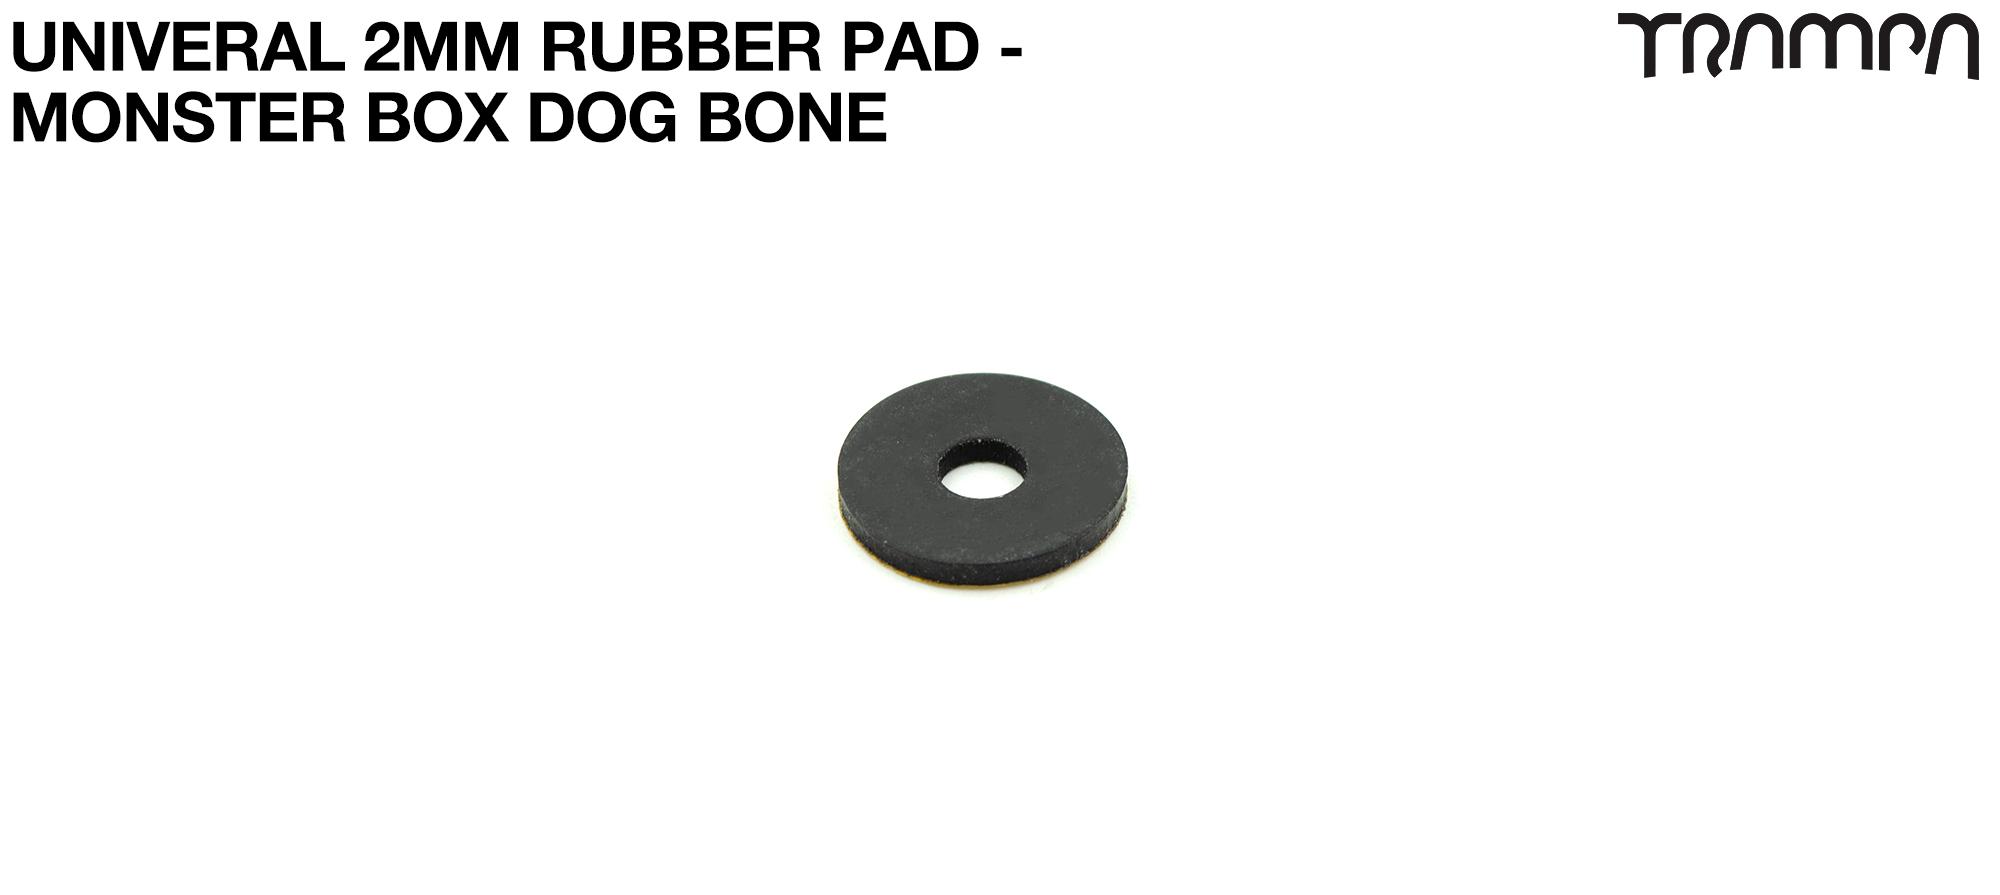 Massive & Classic Monster Box DOG BONE 2mm RUBBER PAD - BOTTOM